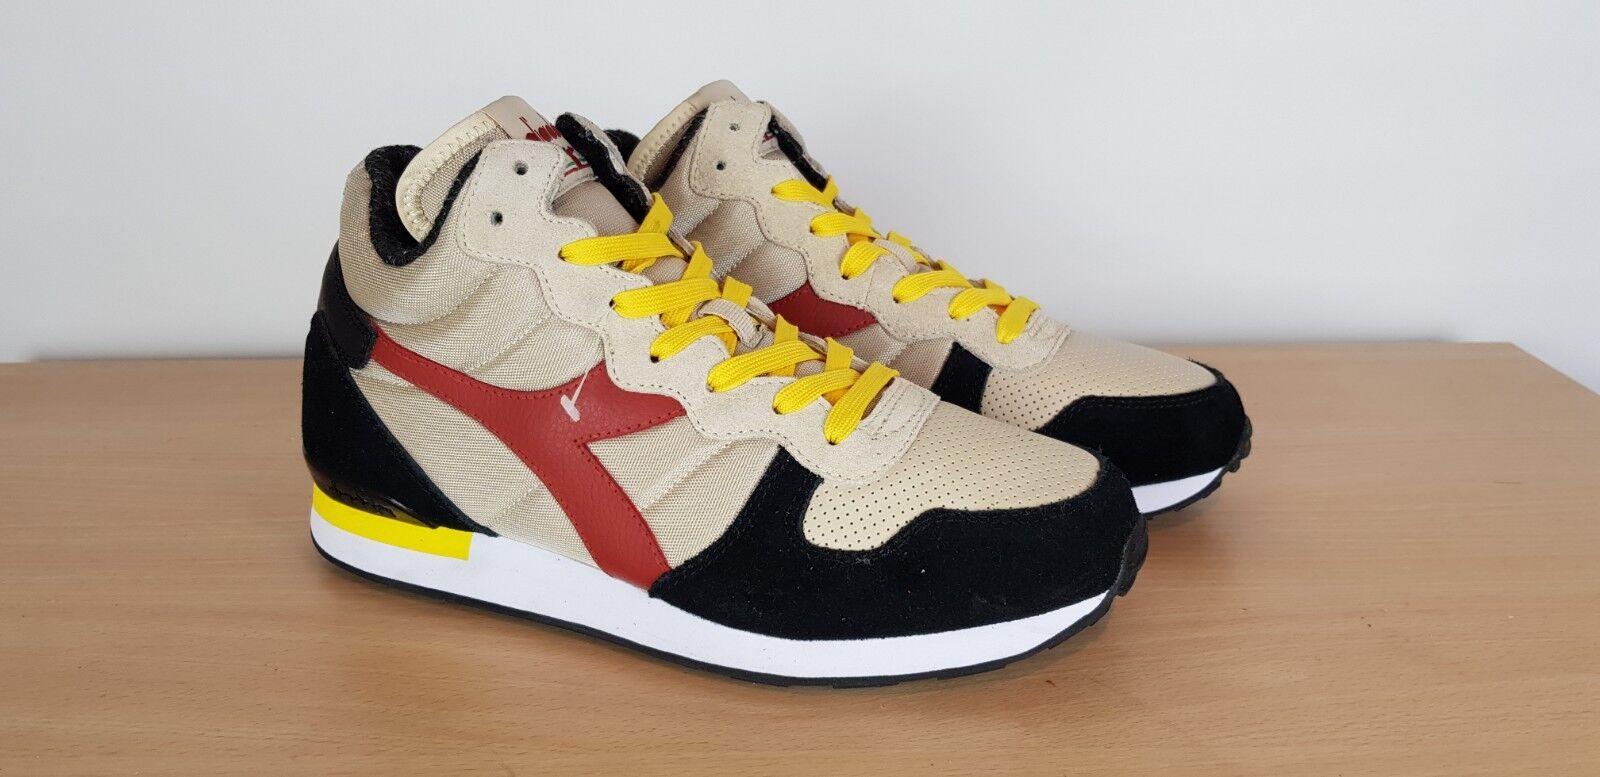 Diadora Mens Textile & Suede Retro Sports Casuals Ankle Stiefel Trainers, UK 8